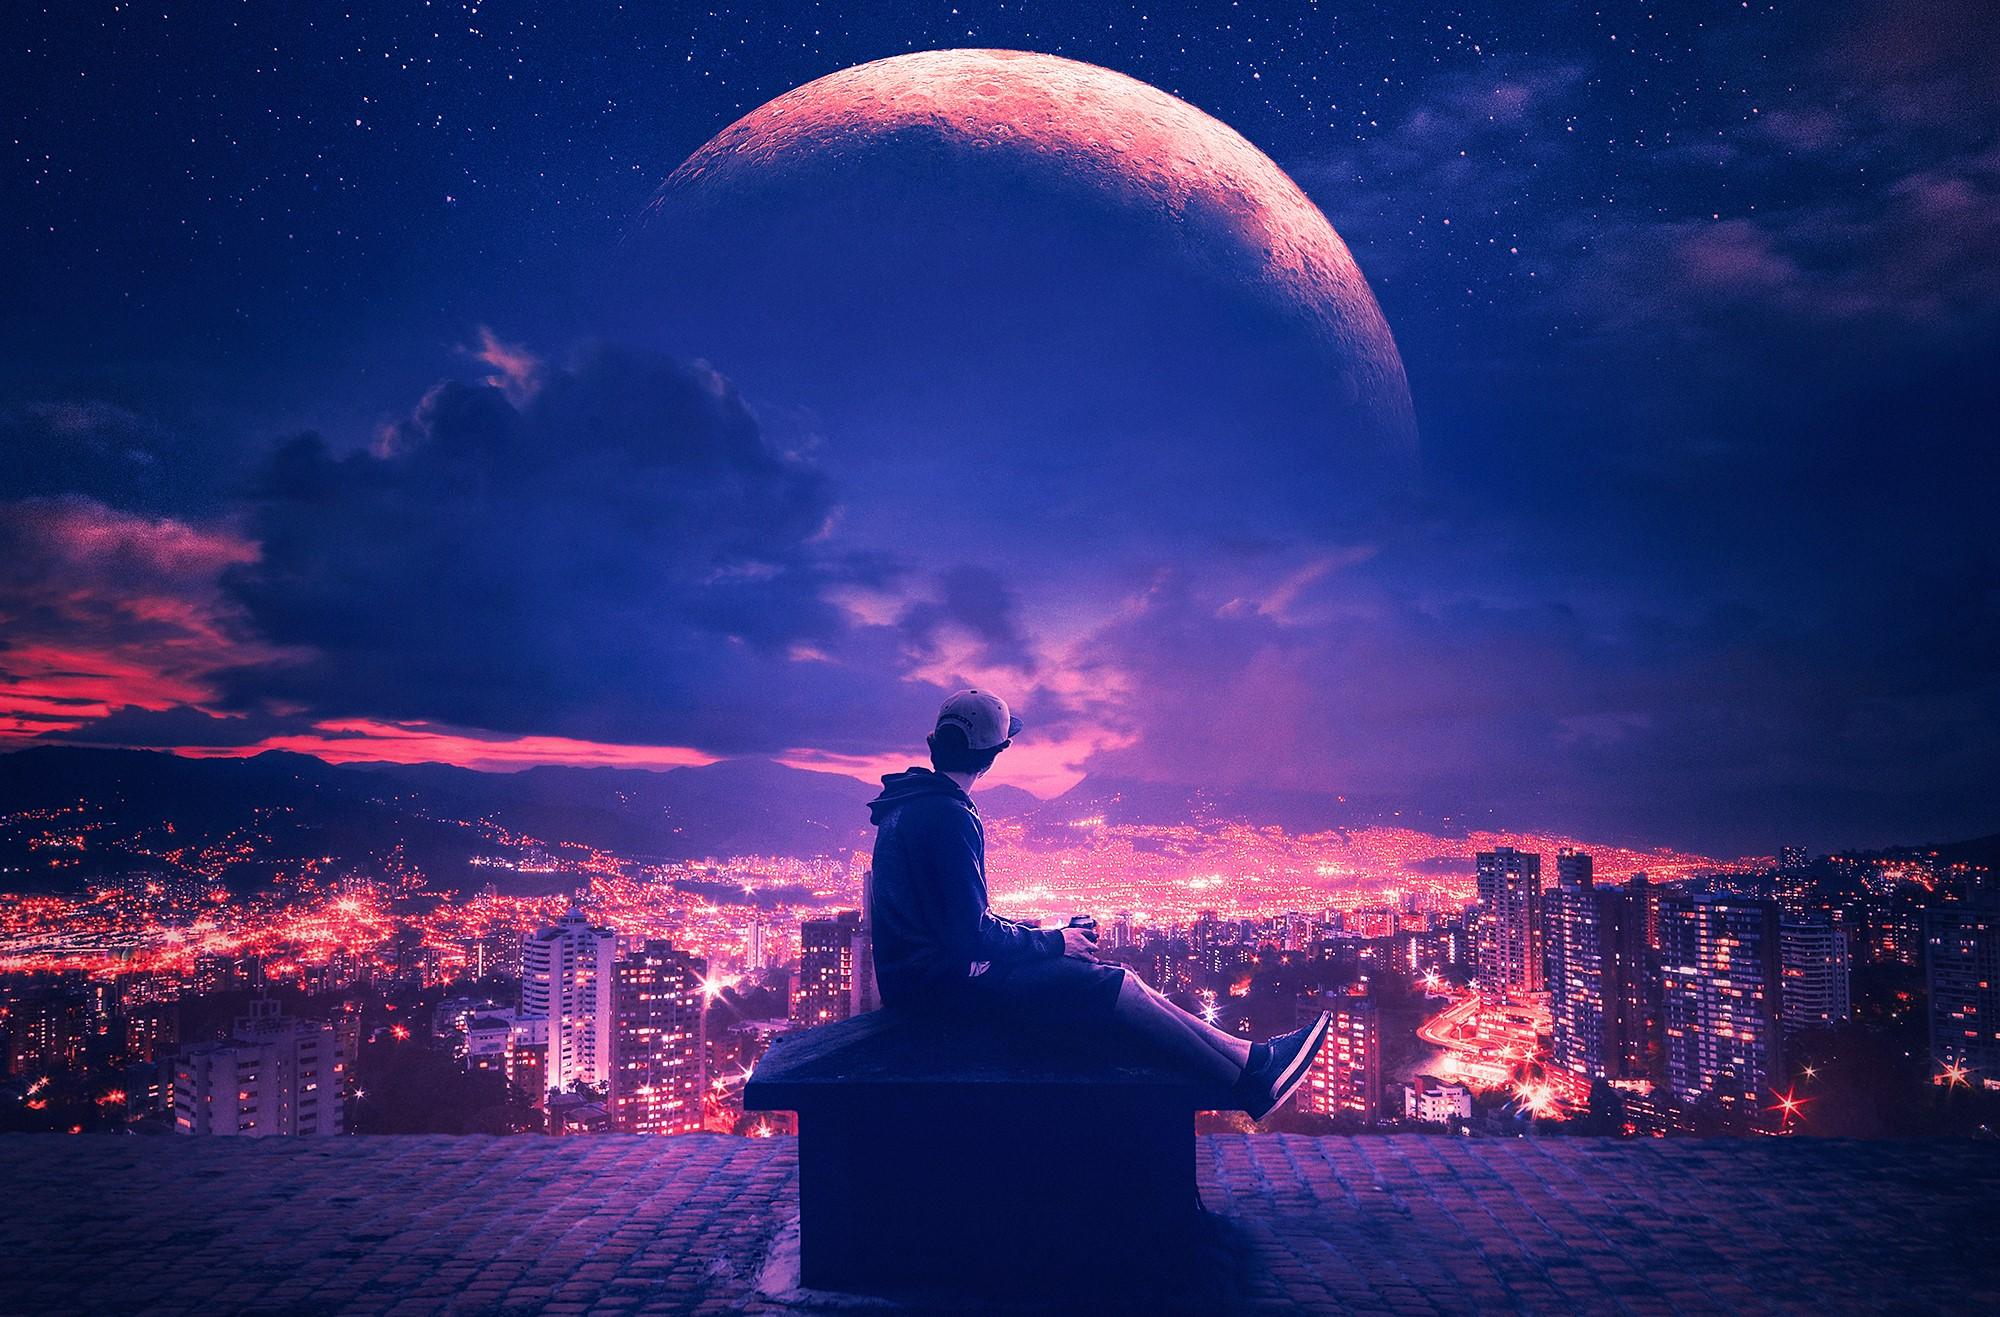 Planet Sky City Purple Night Light Man 2000x1317